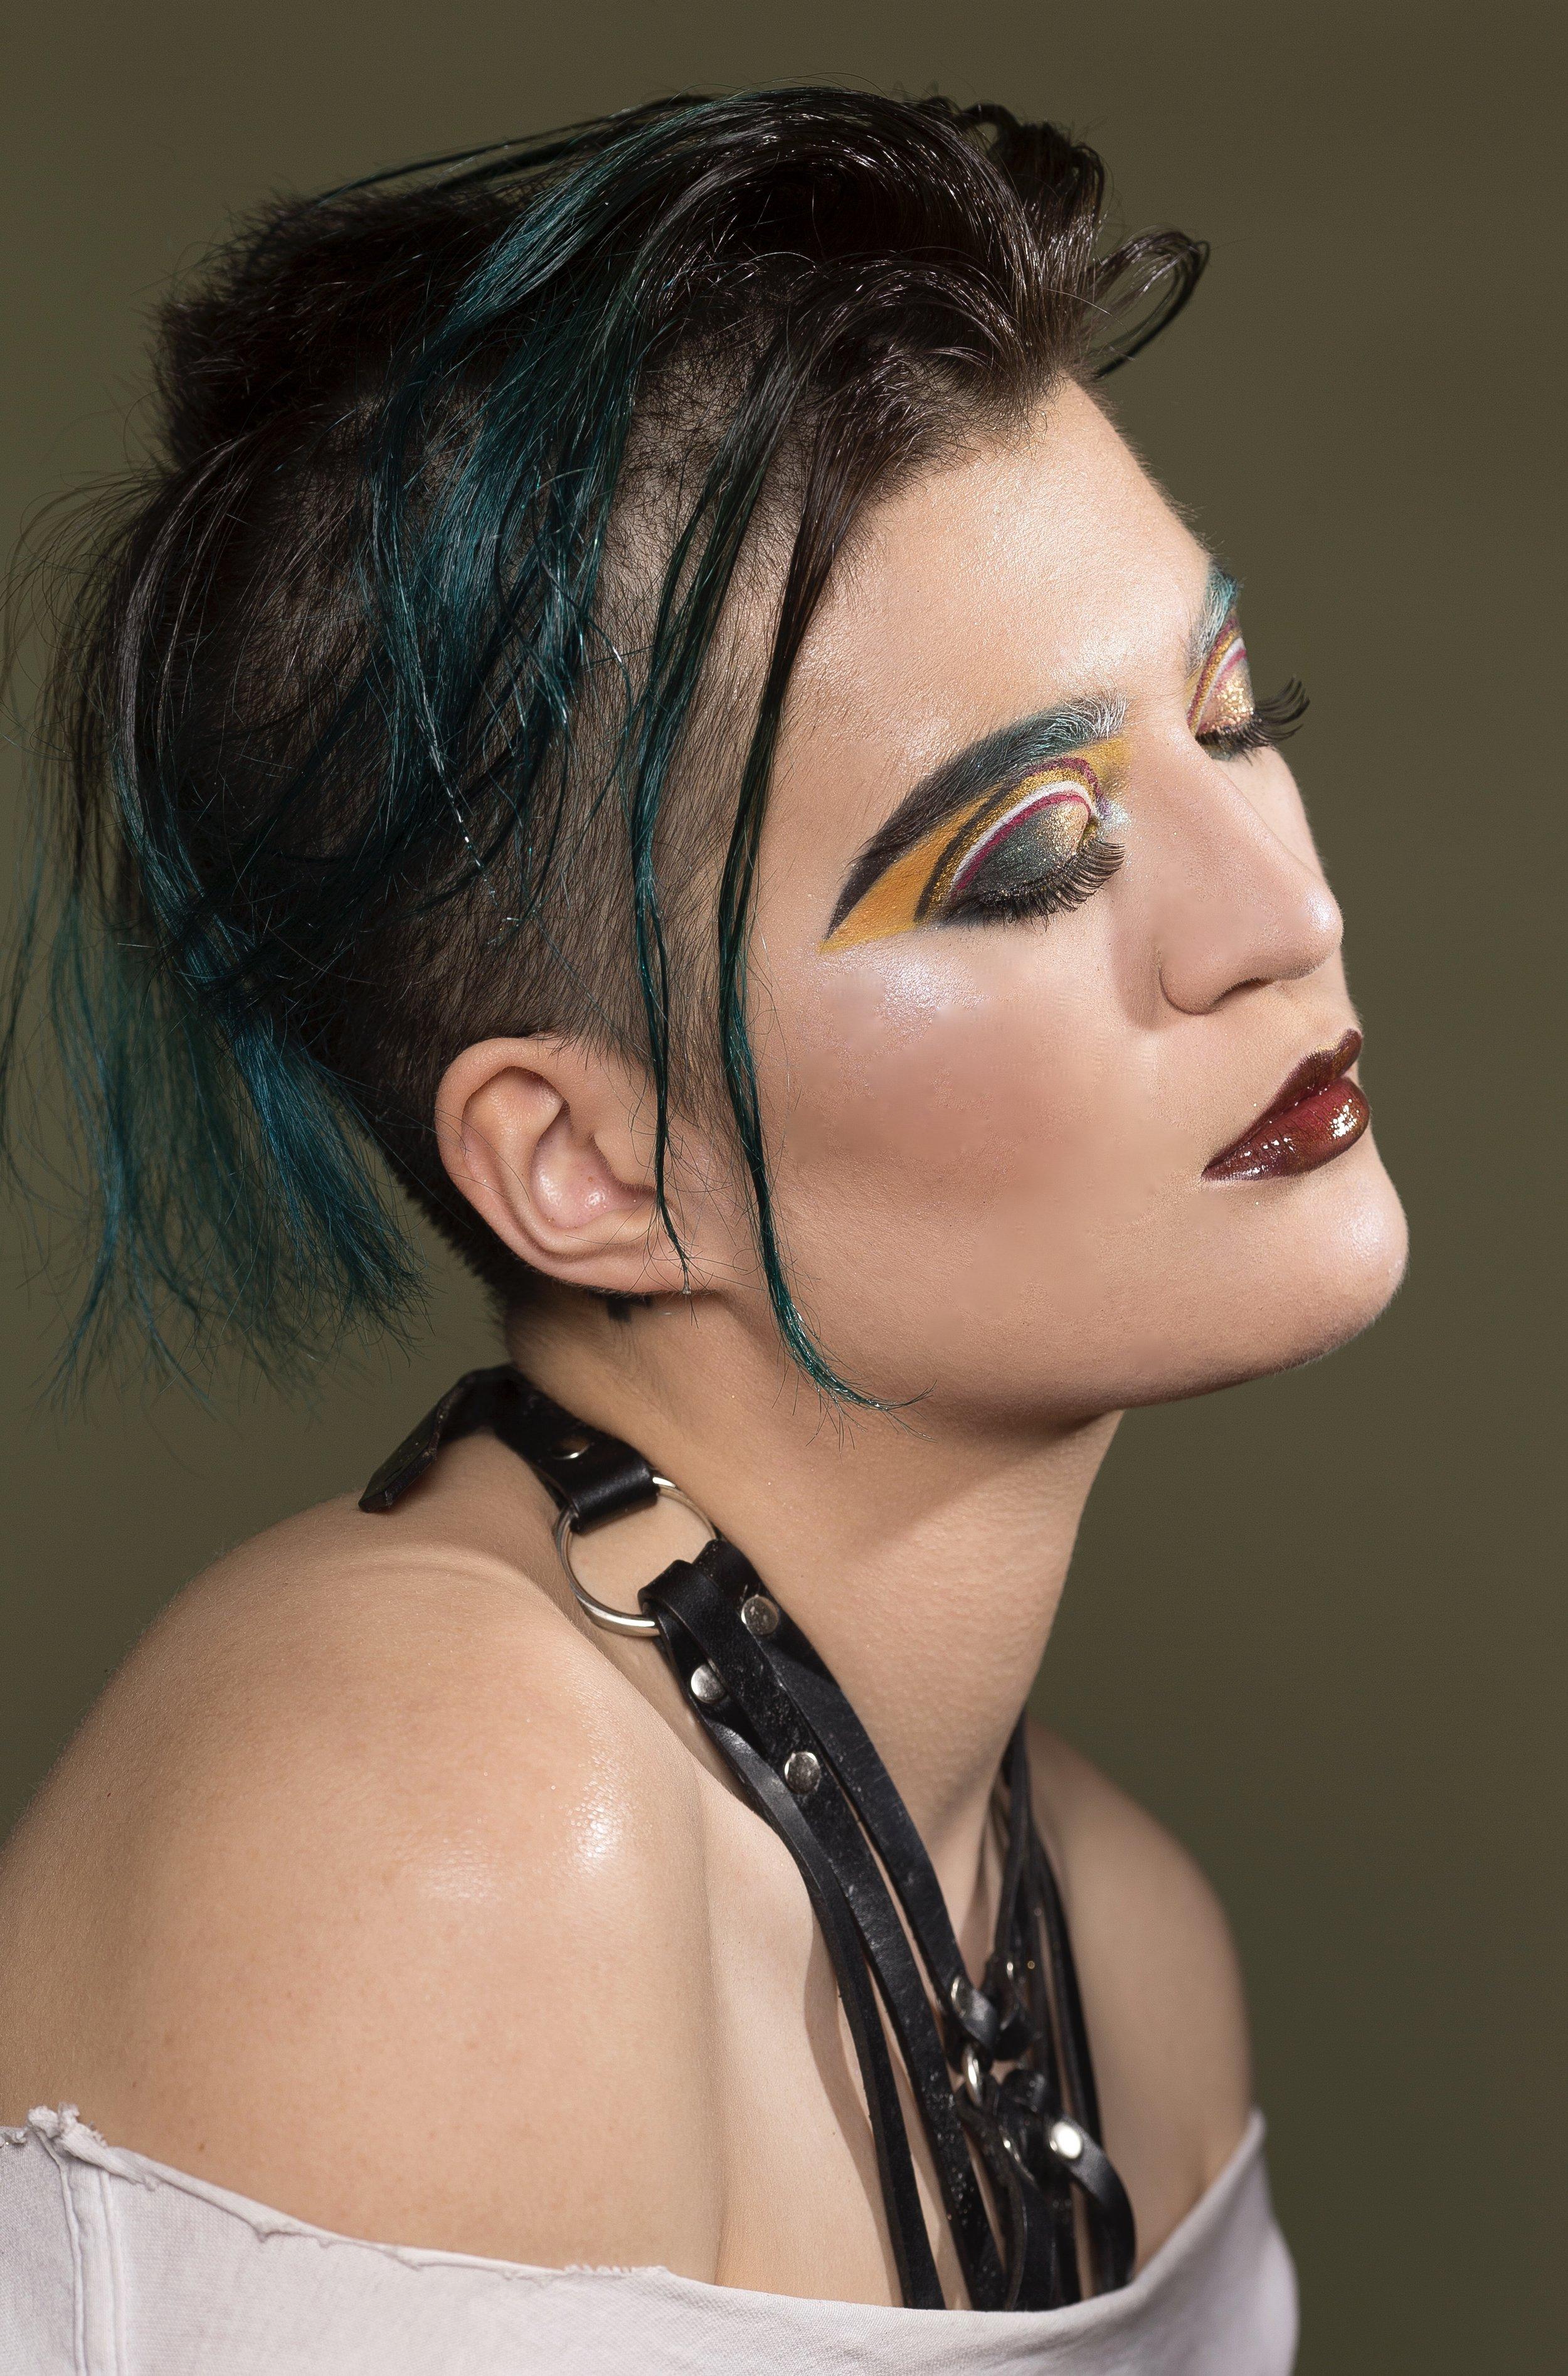 Photography:  Kristiina Wilson   Model:  Arabelle Sicardi   Makeup:  Slater Stanley